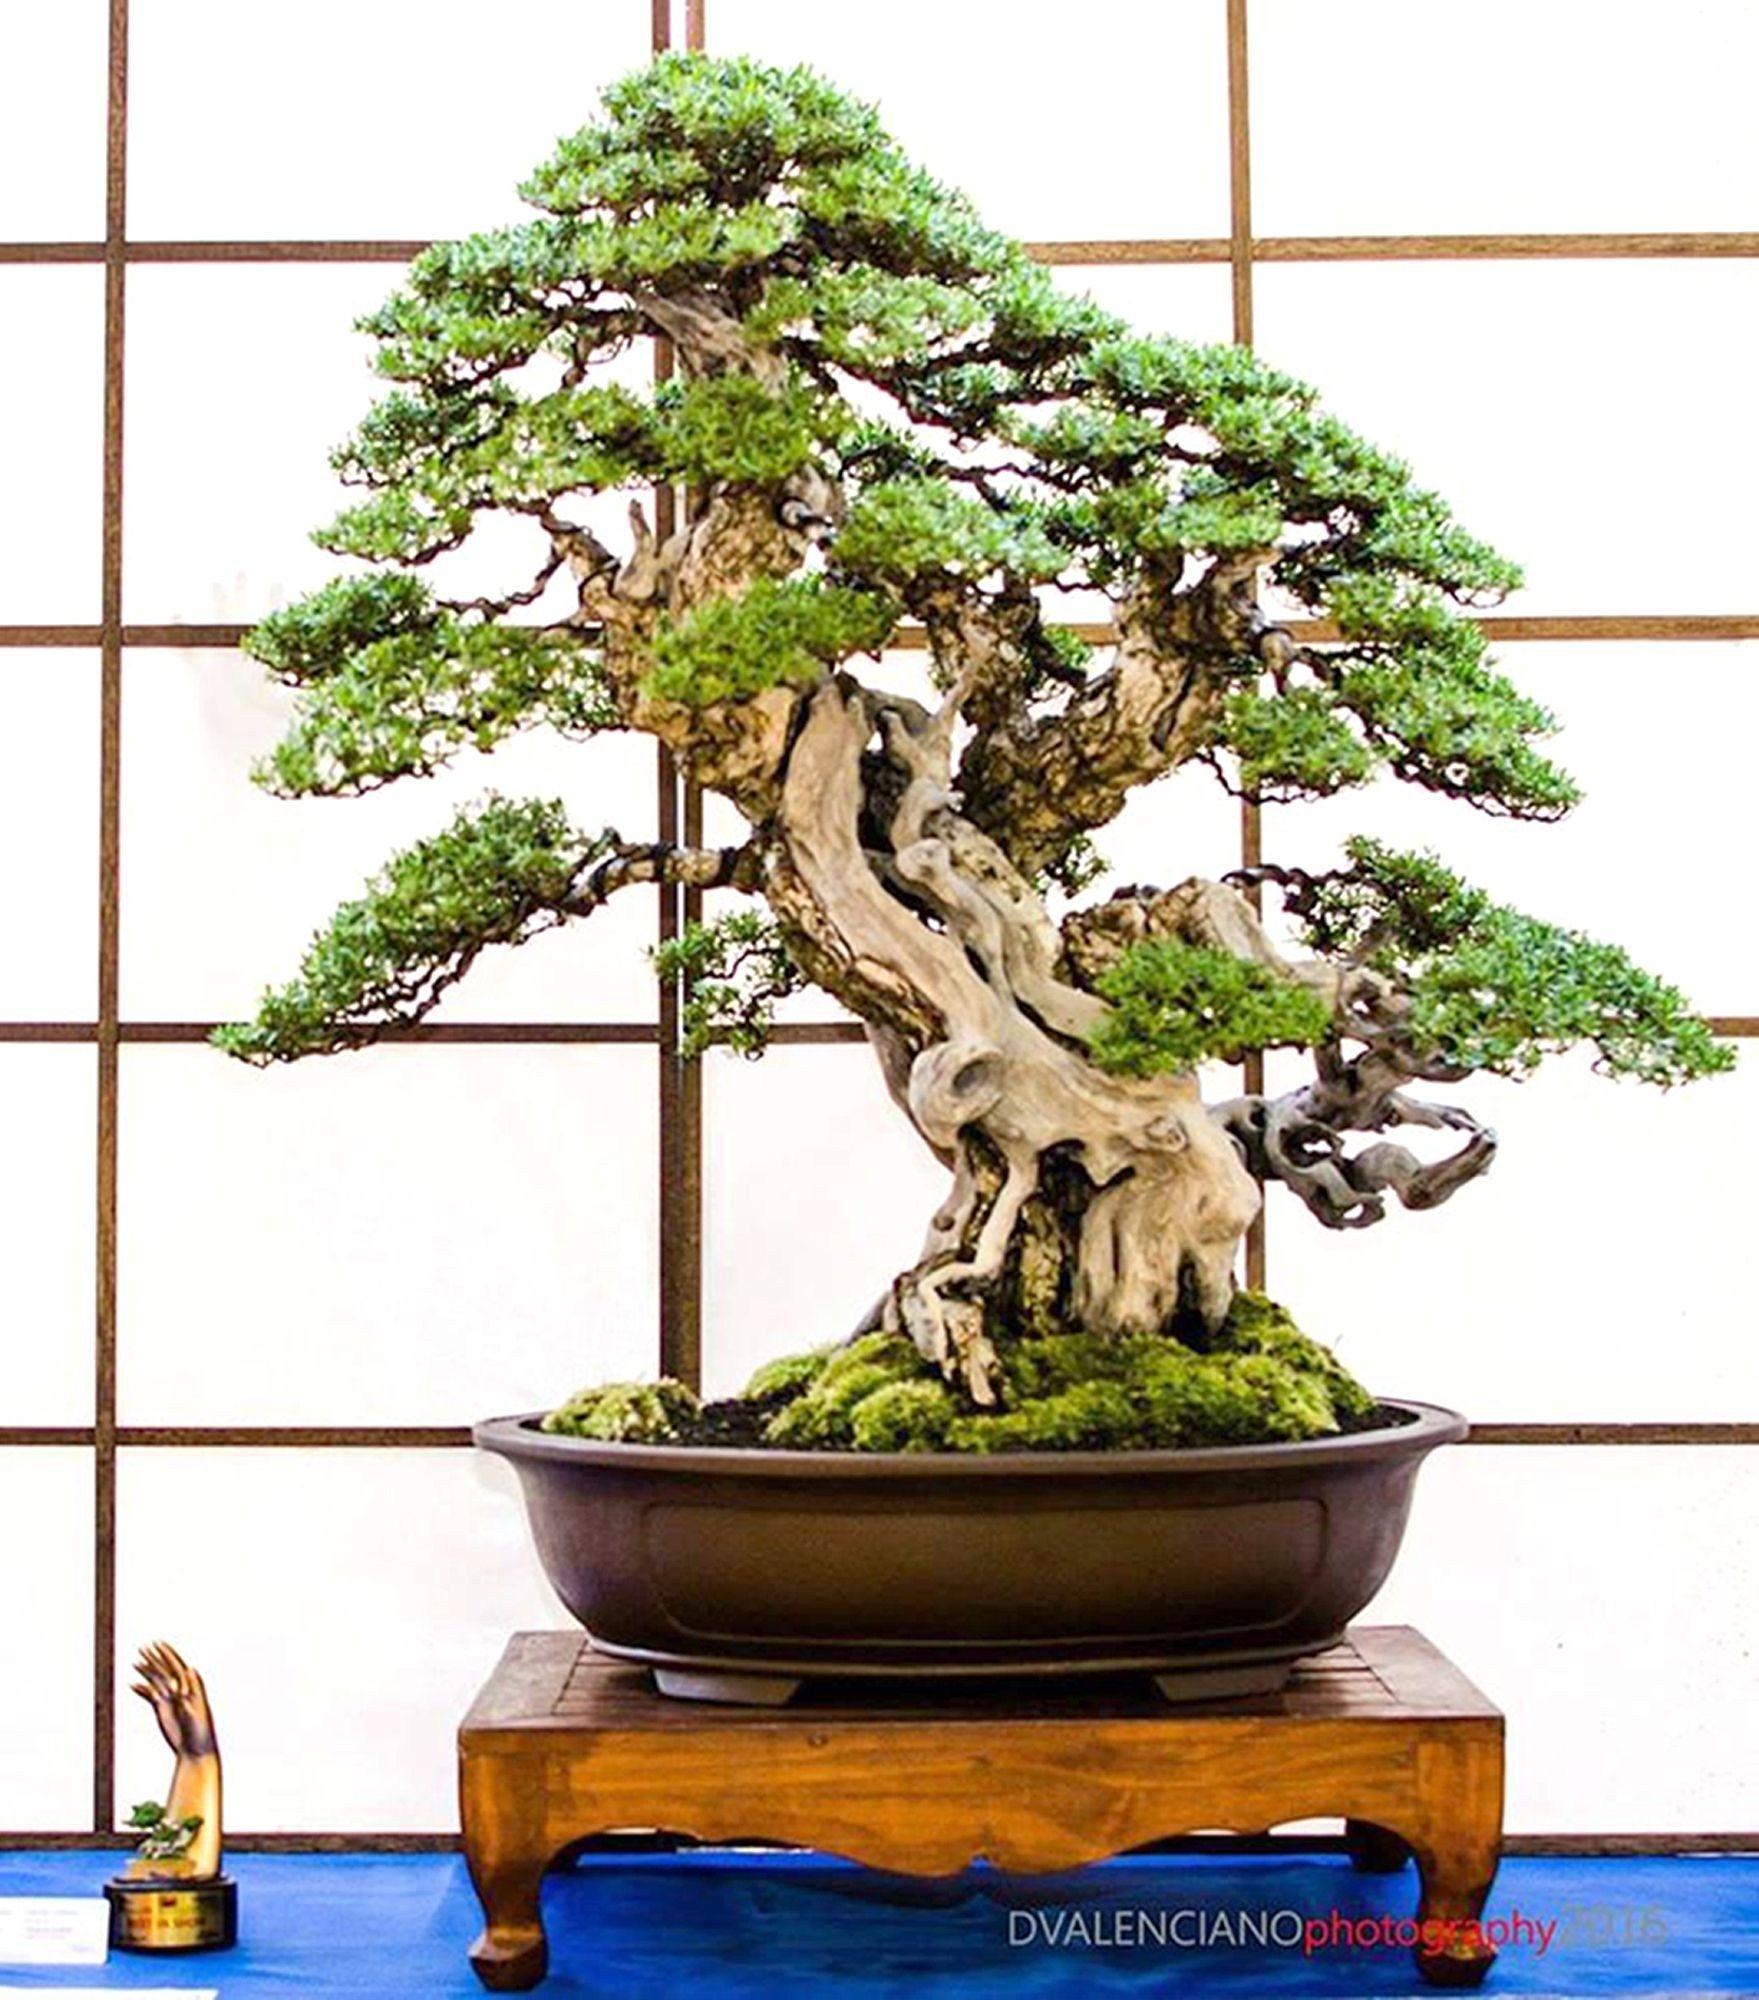 Bonsai Tree 20 Astonishing York Bonsai Inspirations Cherry Blossom Bonsai Tree Bonsai Plants For Sale Bonsai Trees For Sale